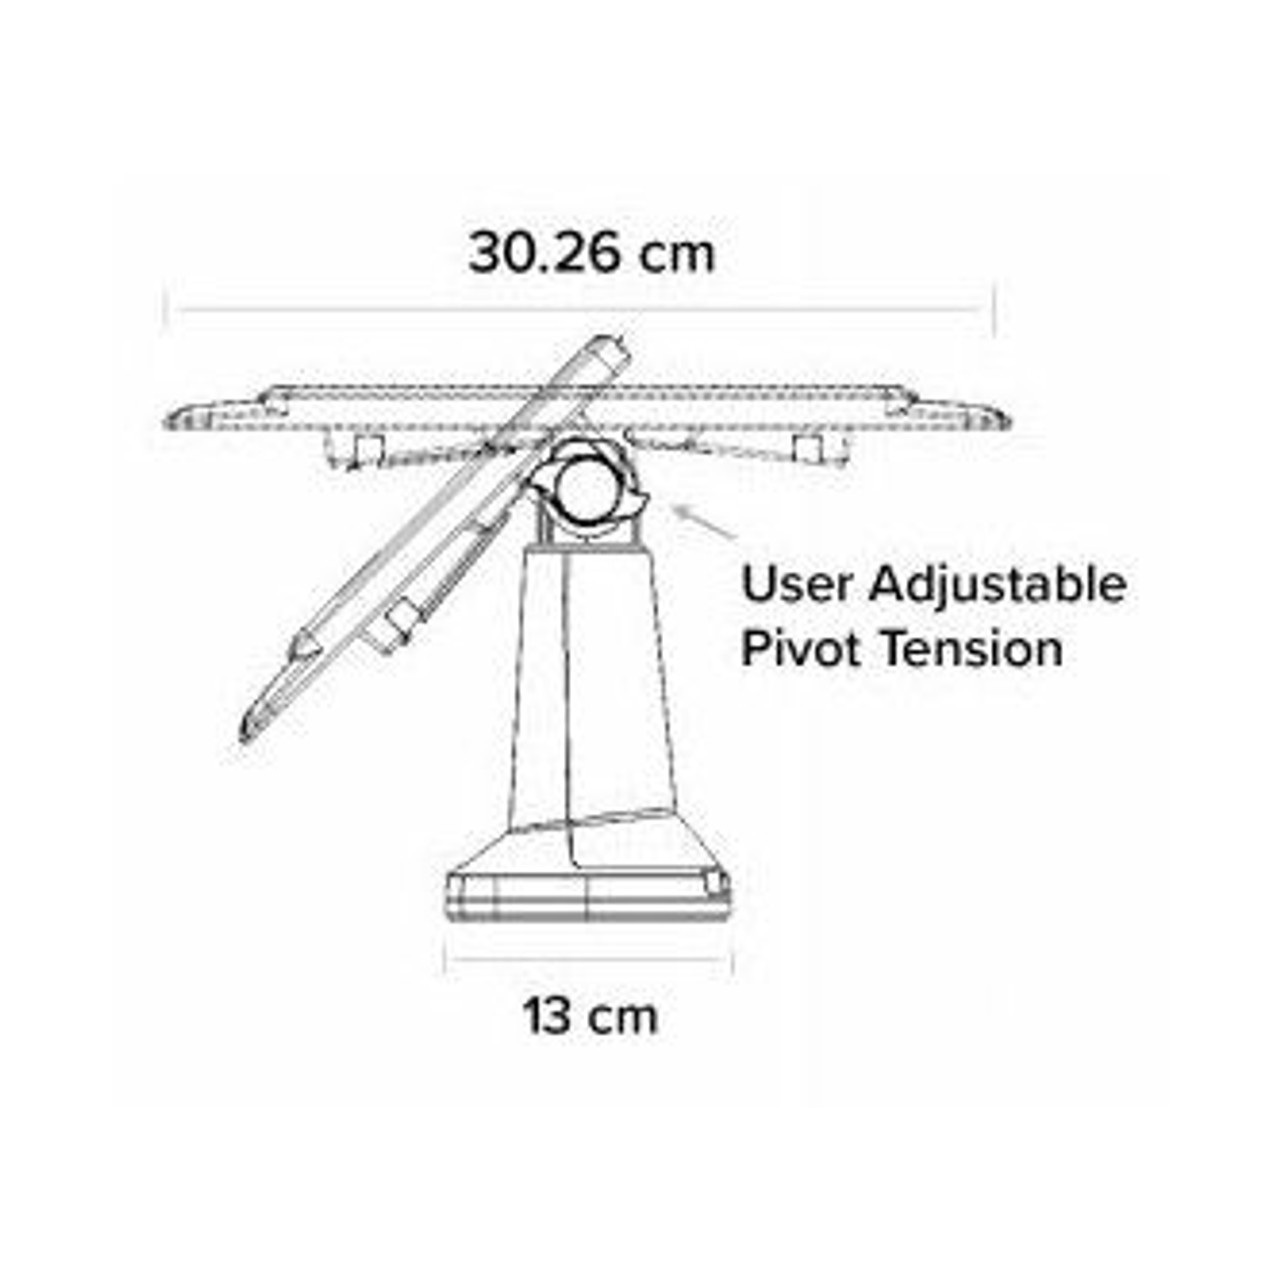 Ingenico iSC250 Tailwind FlexiPole Plus Stand